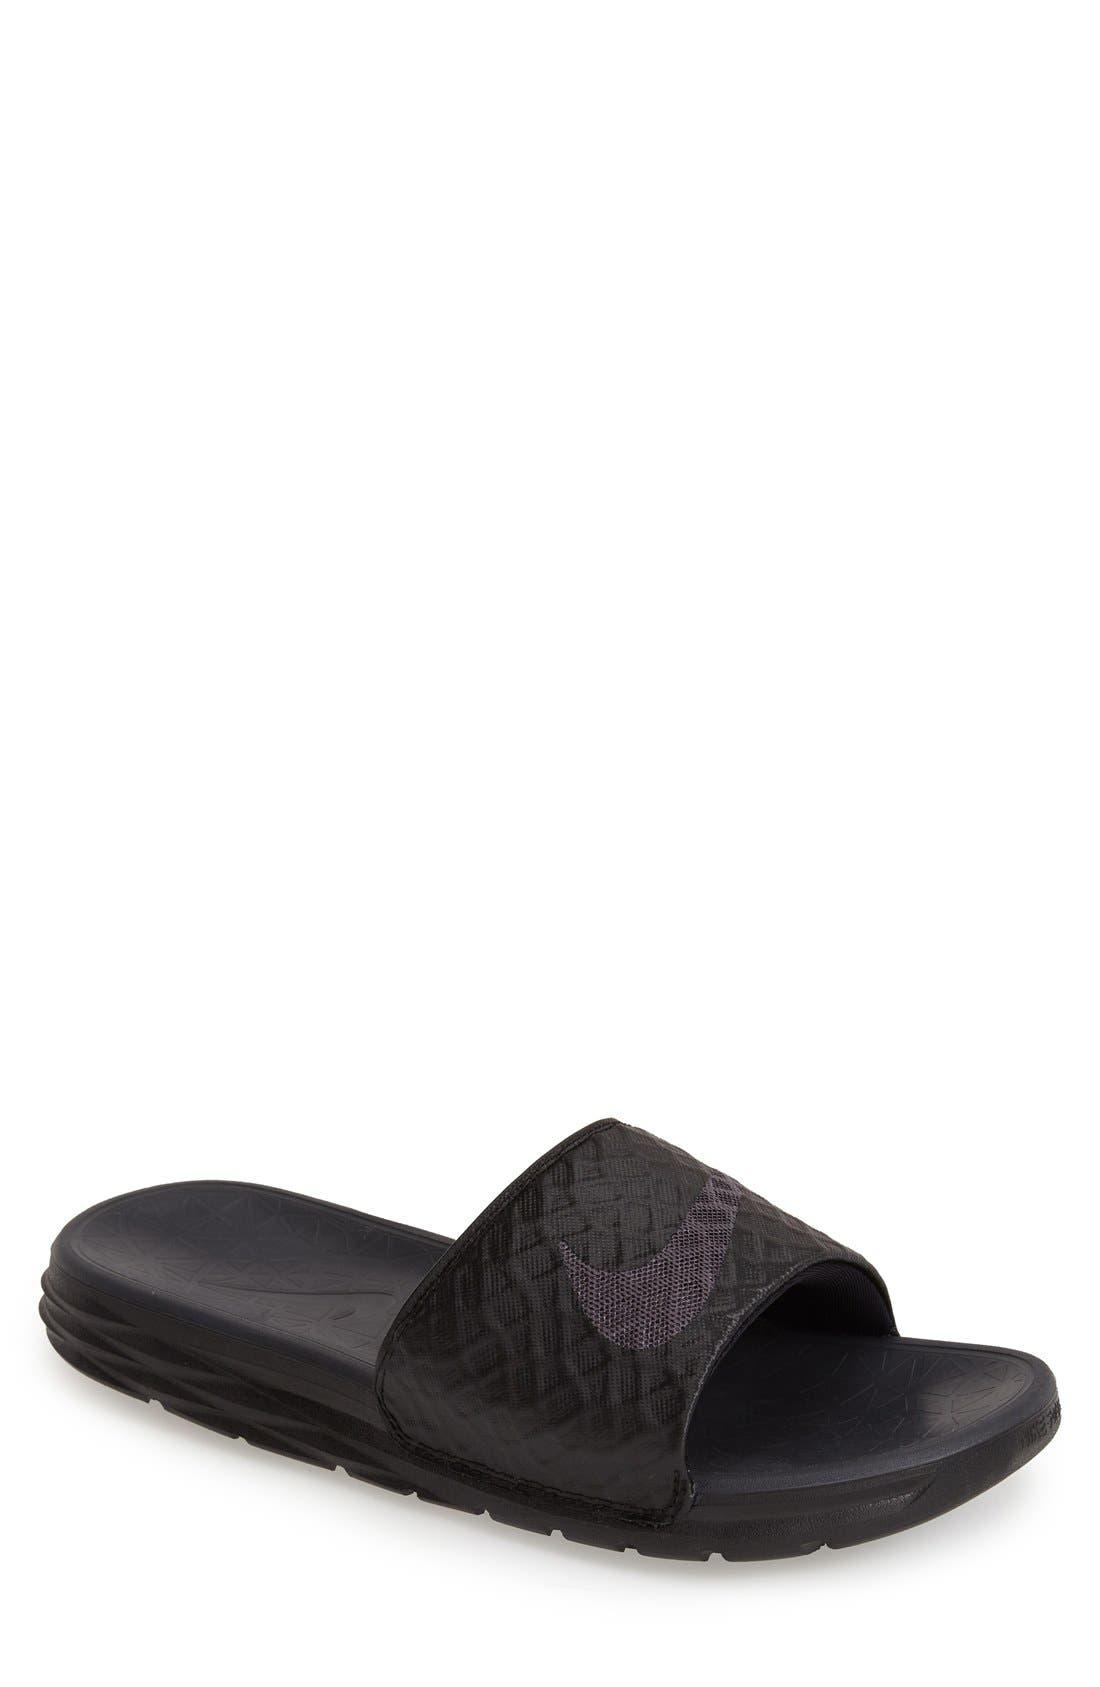 'Benassi Solarsoft 2' Slide Sandal,                             Main thumbnail 1, color,                             BLACK/ ANTHRACITE